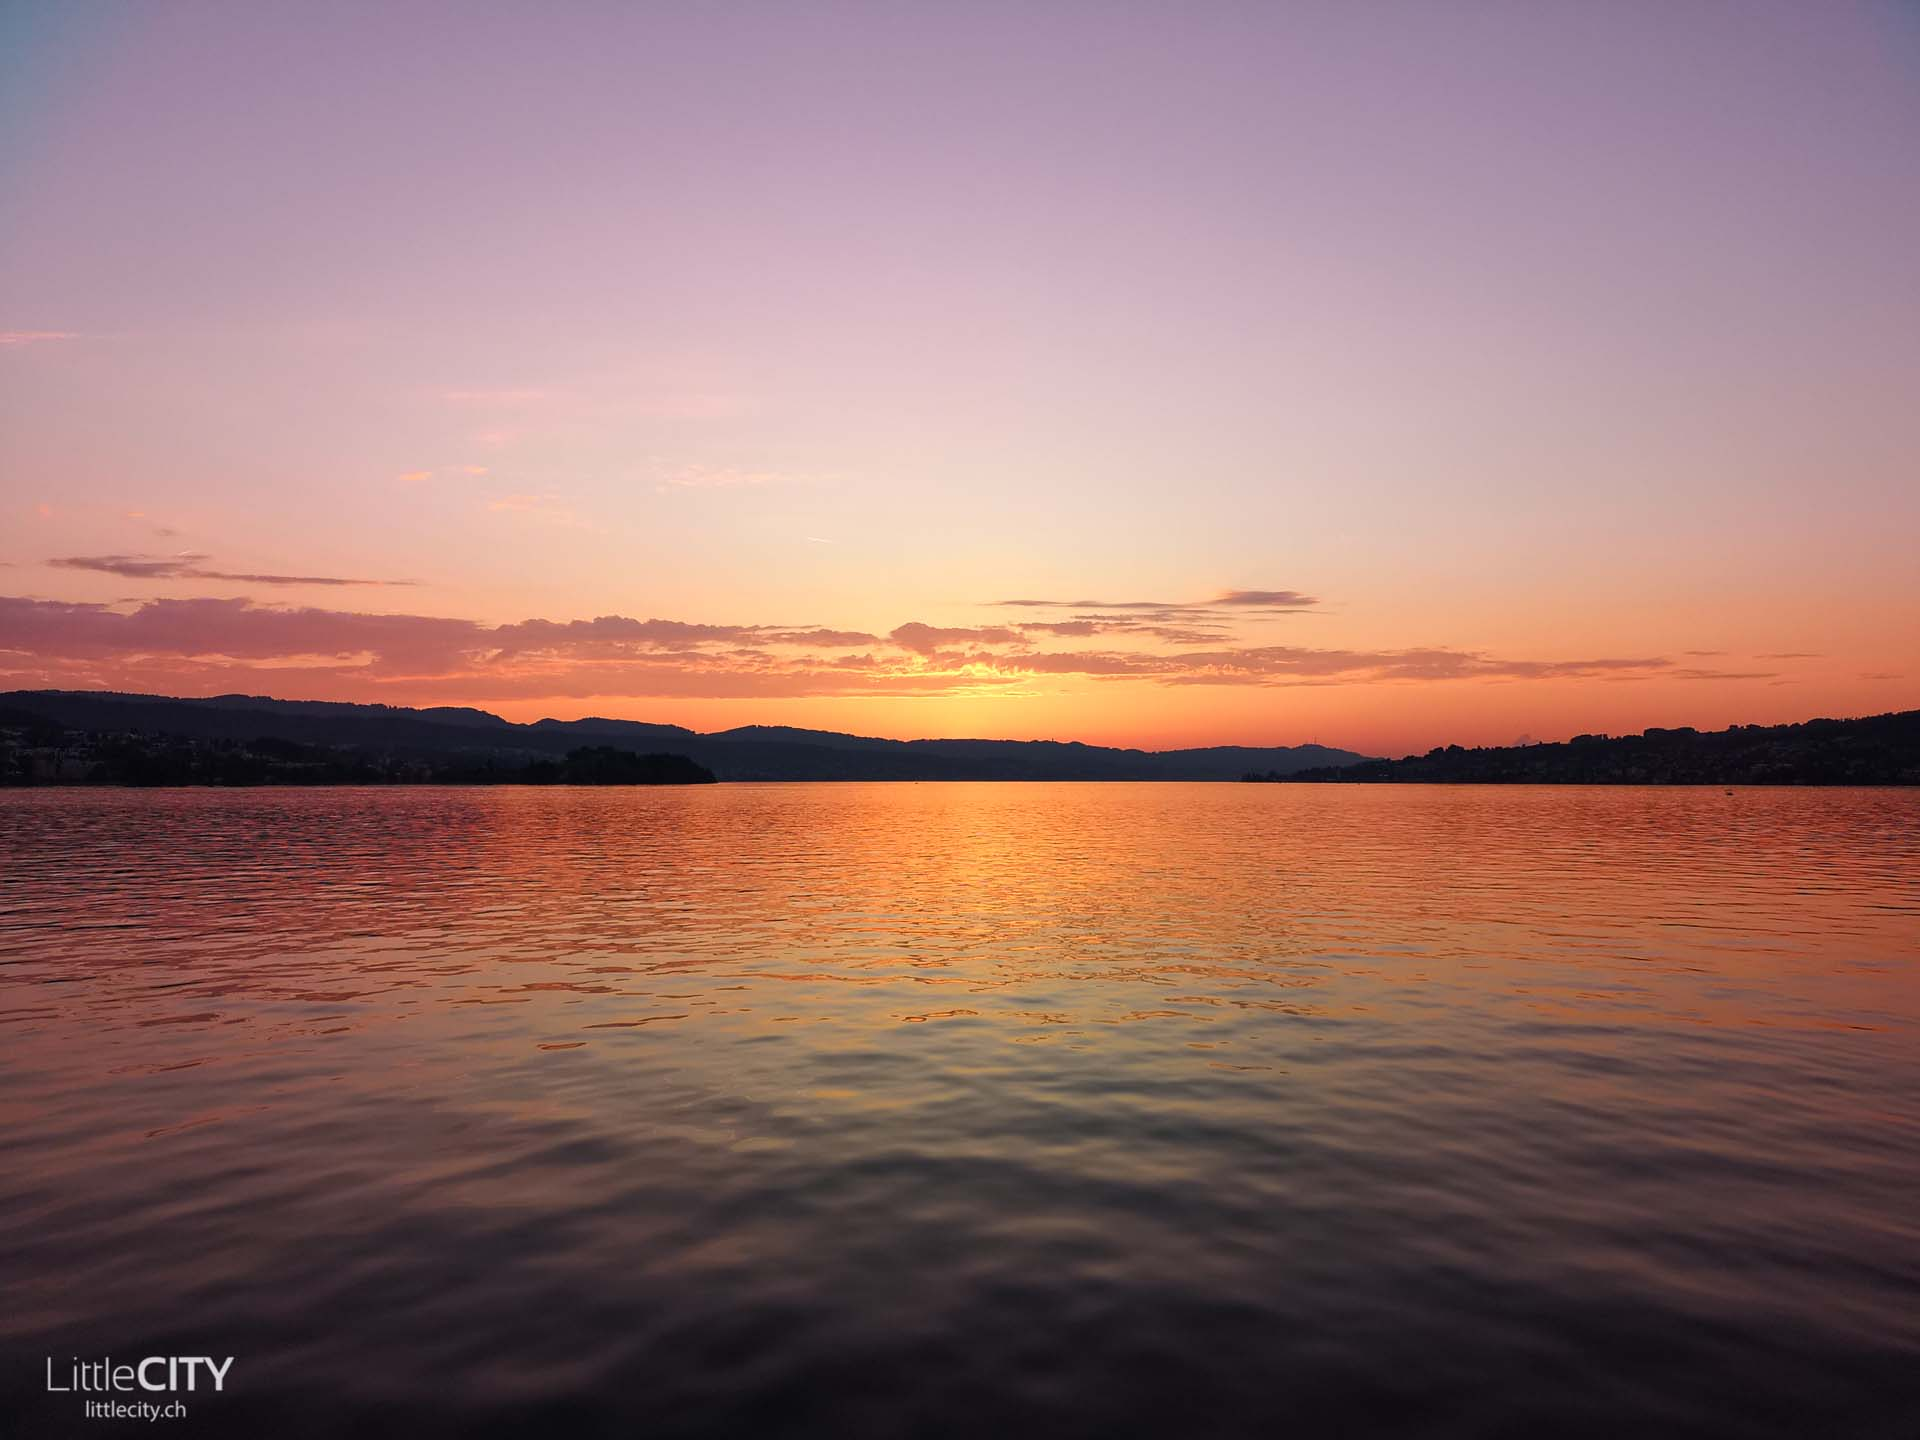 Huawei P20 Pro Zürichsee Schiffahrt Sonnenuntergang